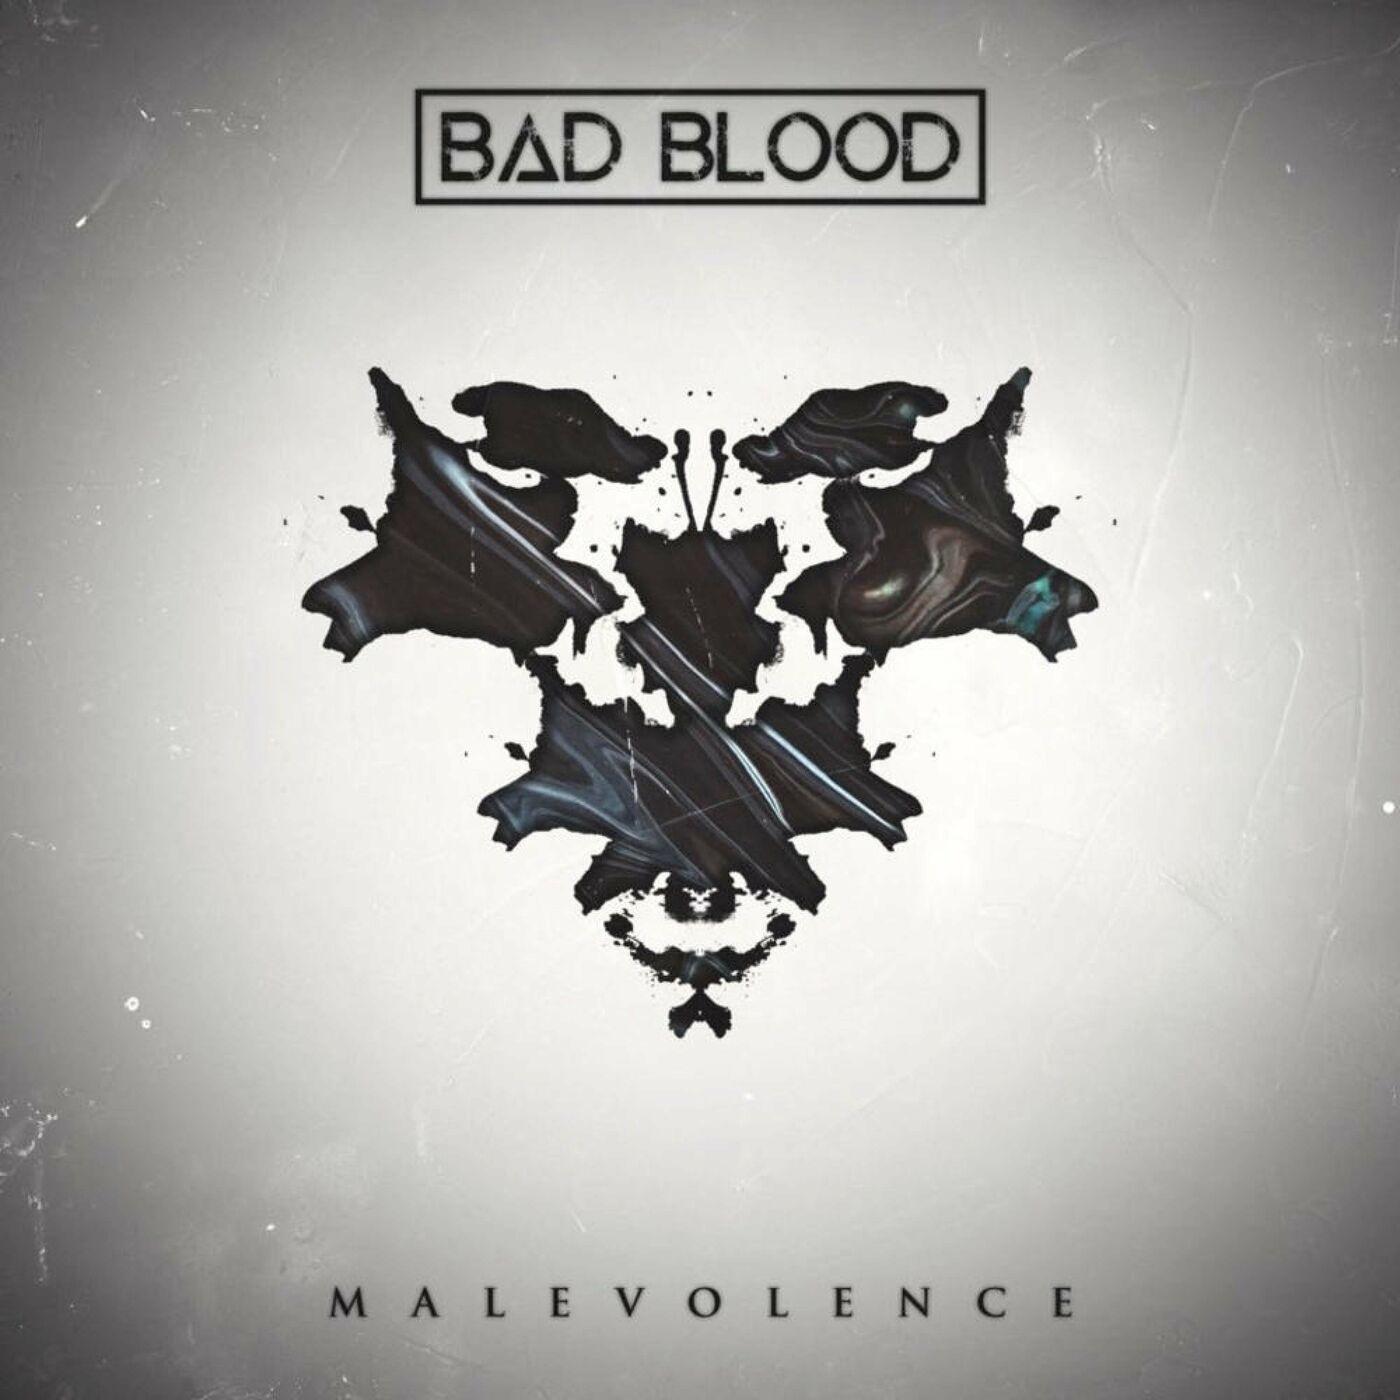 Bad Blood - Malevolence [single] (2020)